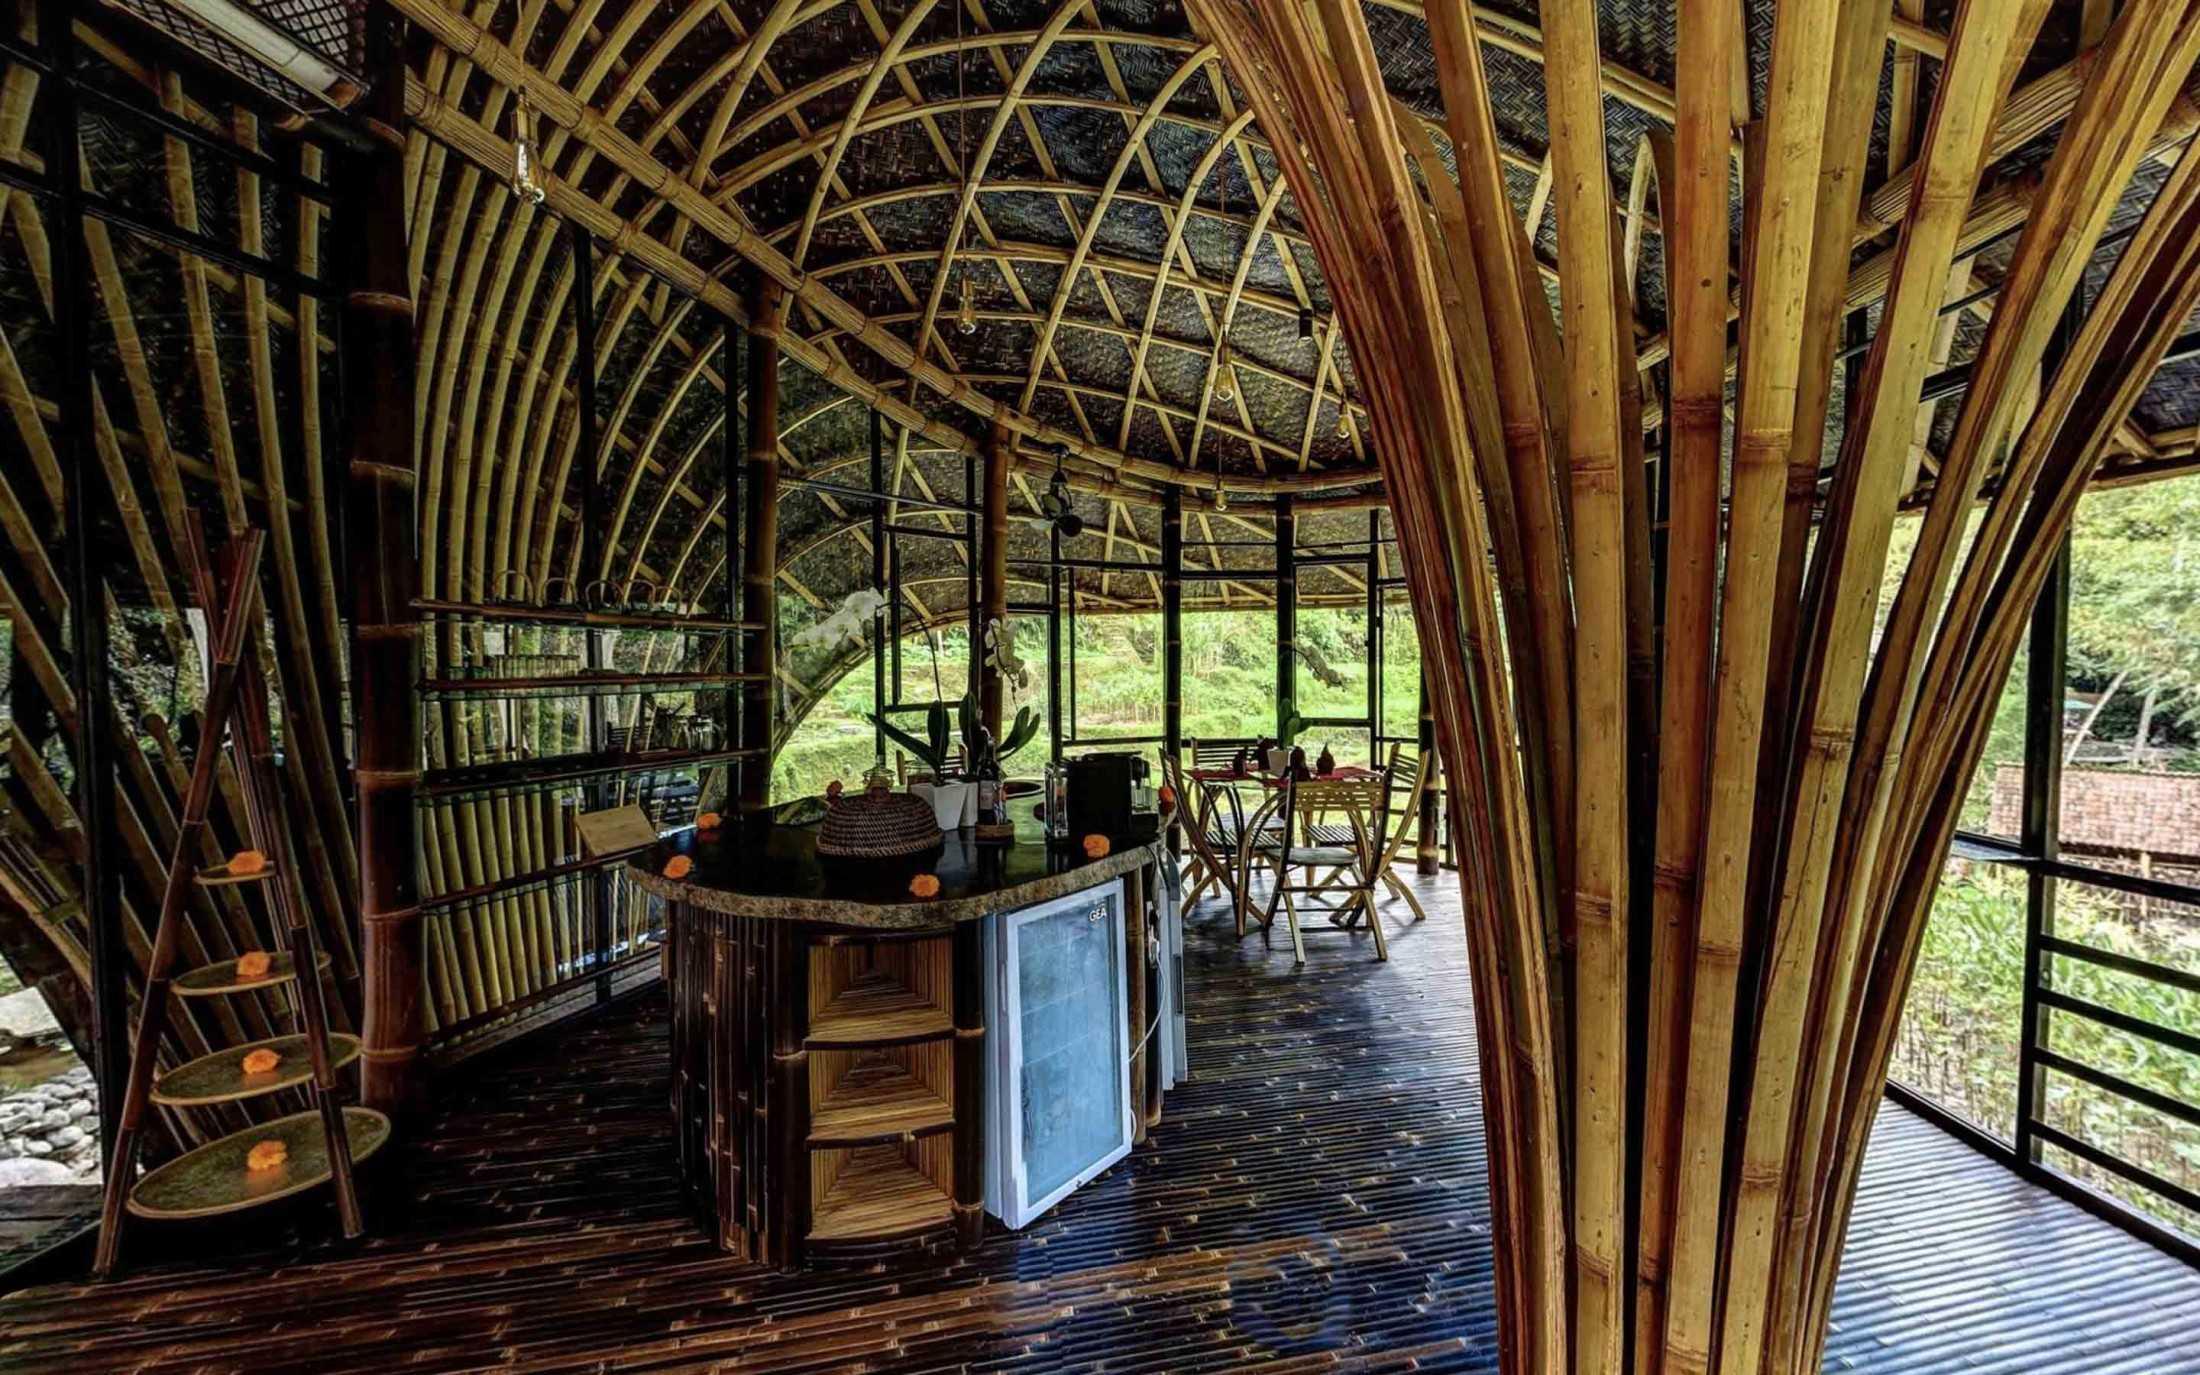 Agung Budi Raharsa | Architecture & Engineering Riverbend Bamboo House - Bali Bali, Indonesia Bali, Indonesia Agung-Budi-Raharsa-Riverbend-House-Bali  88712